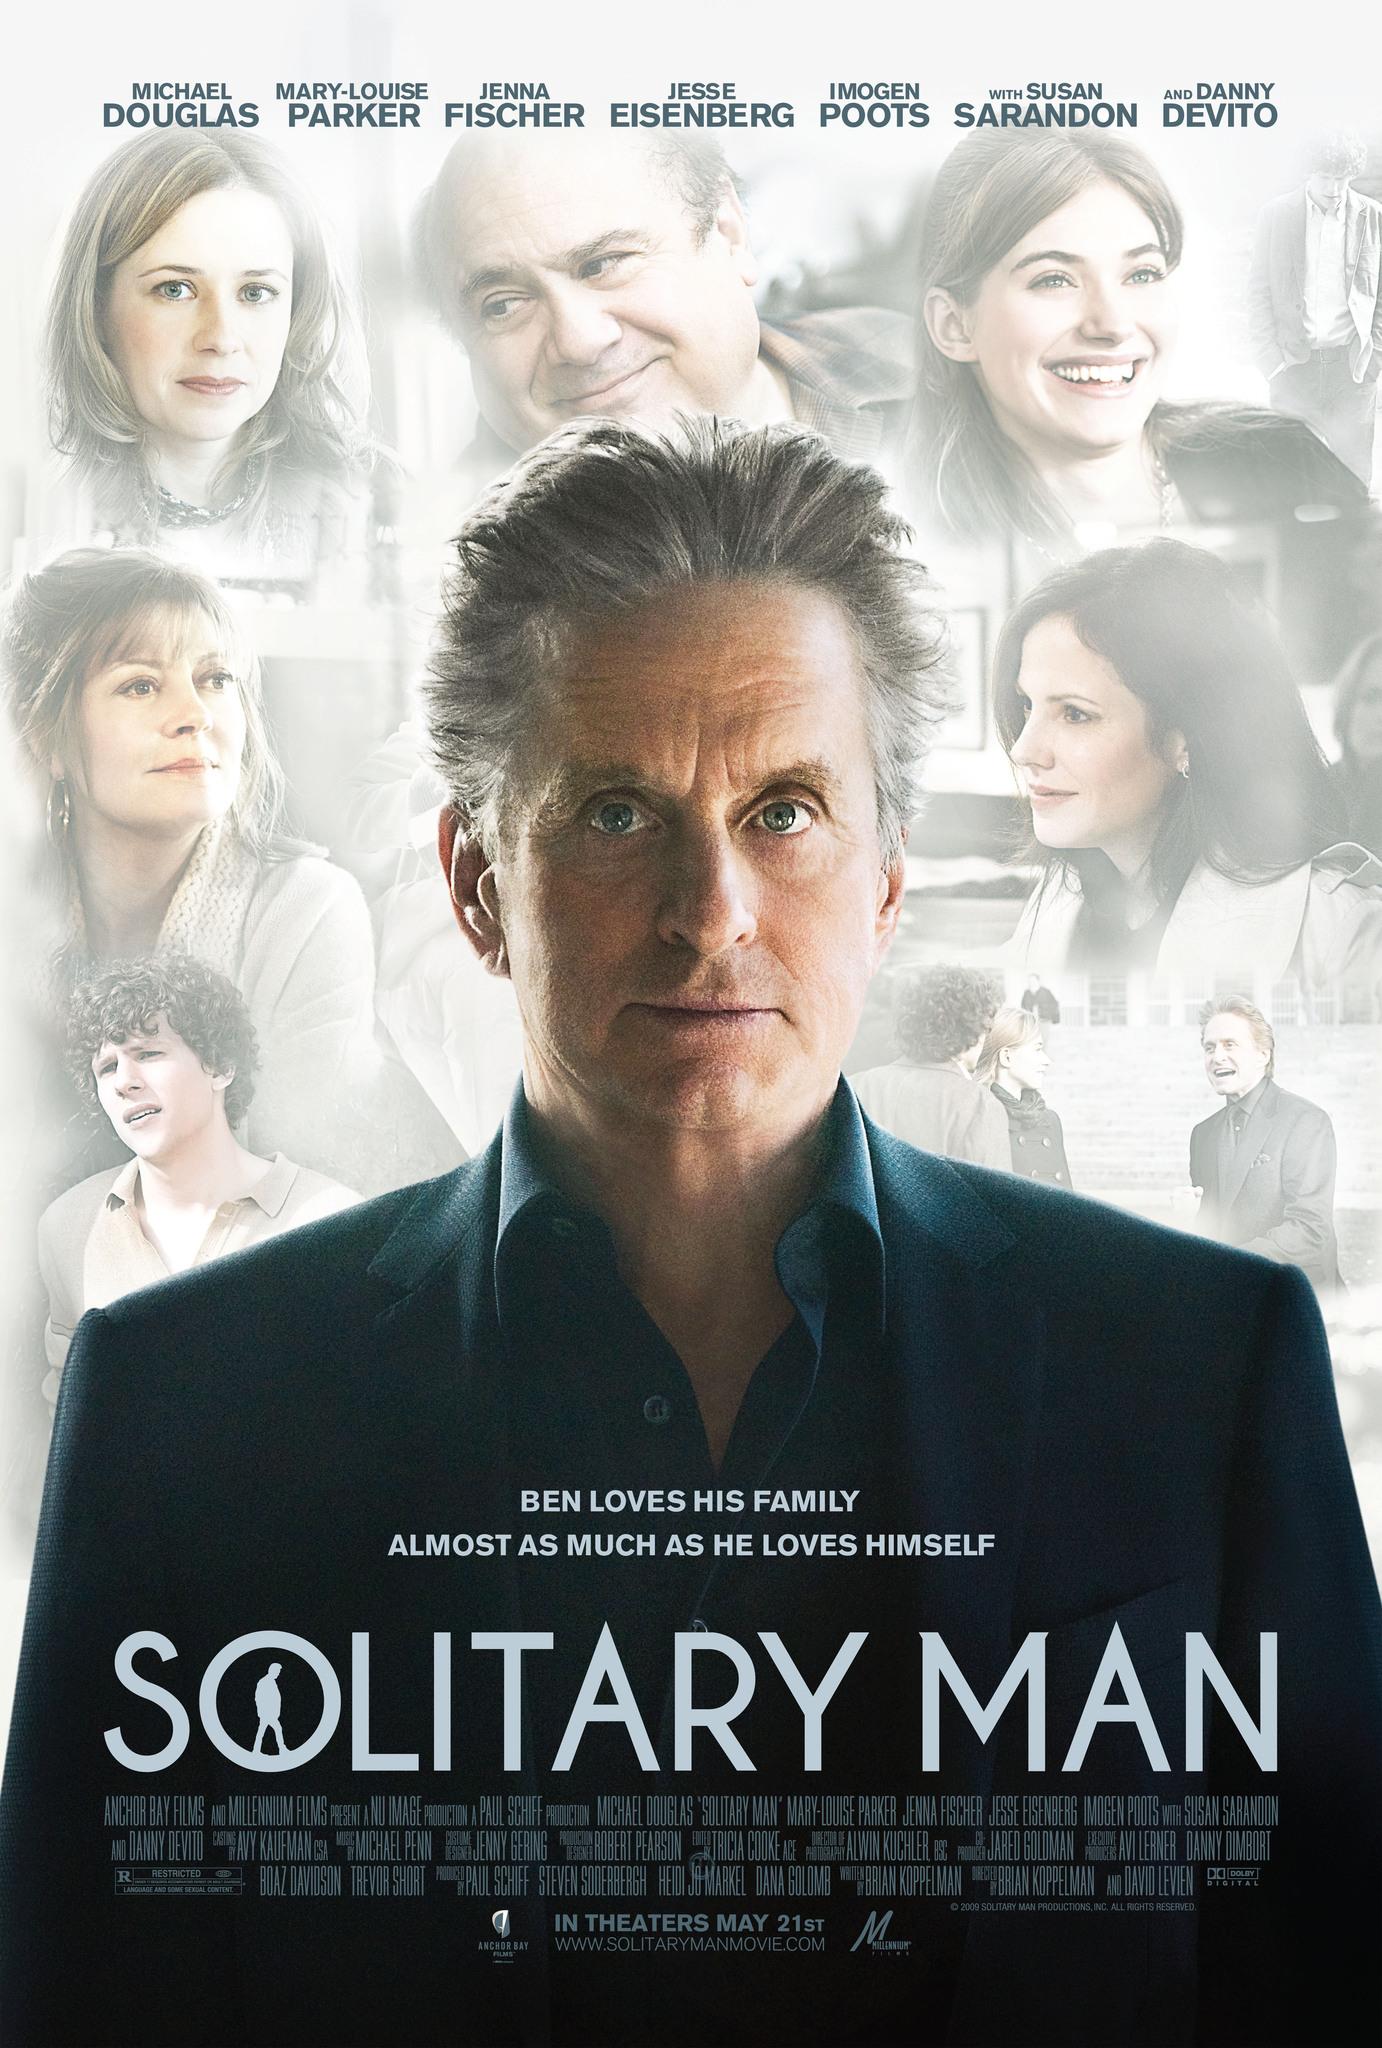 Him solitary man single